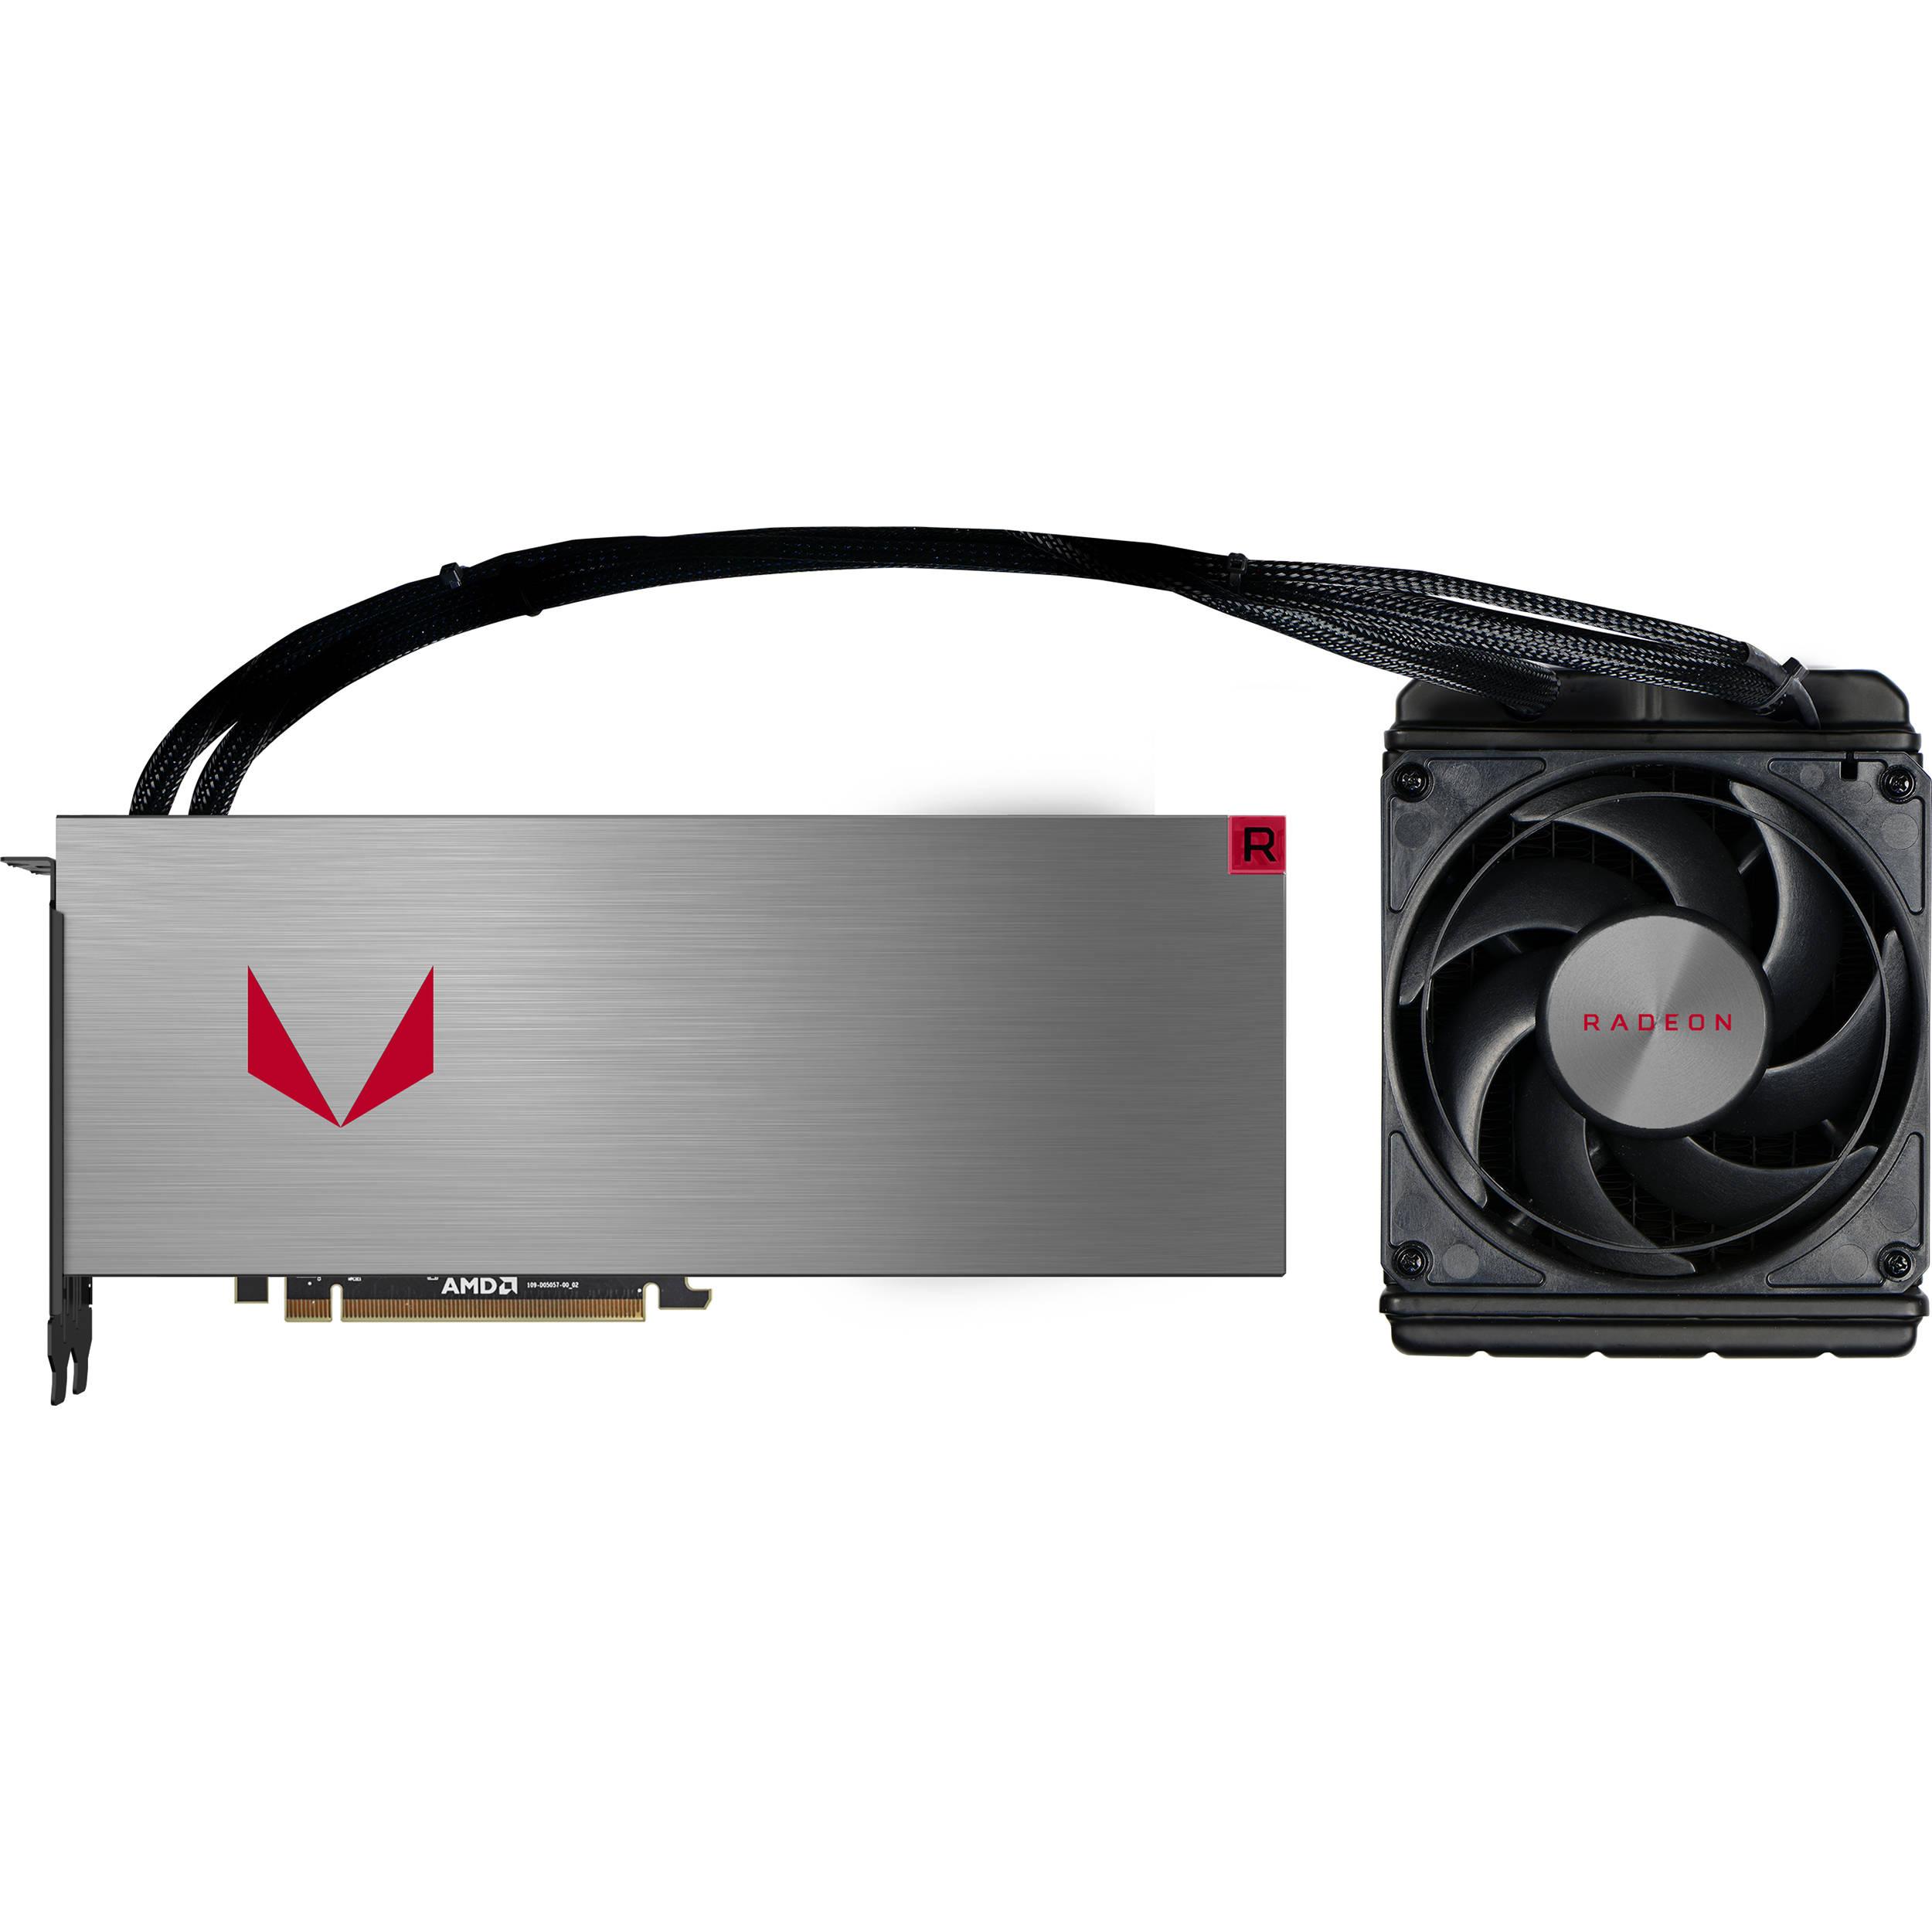 MSI Radeon RX Vega 64 Wave 8G Graphics Card